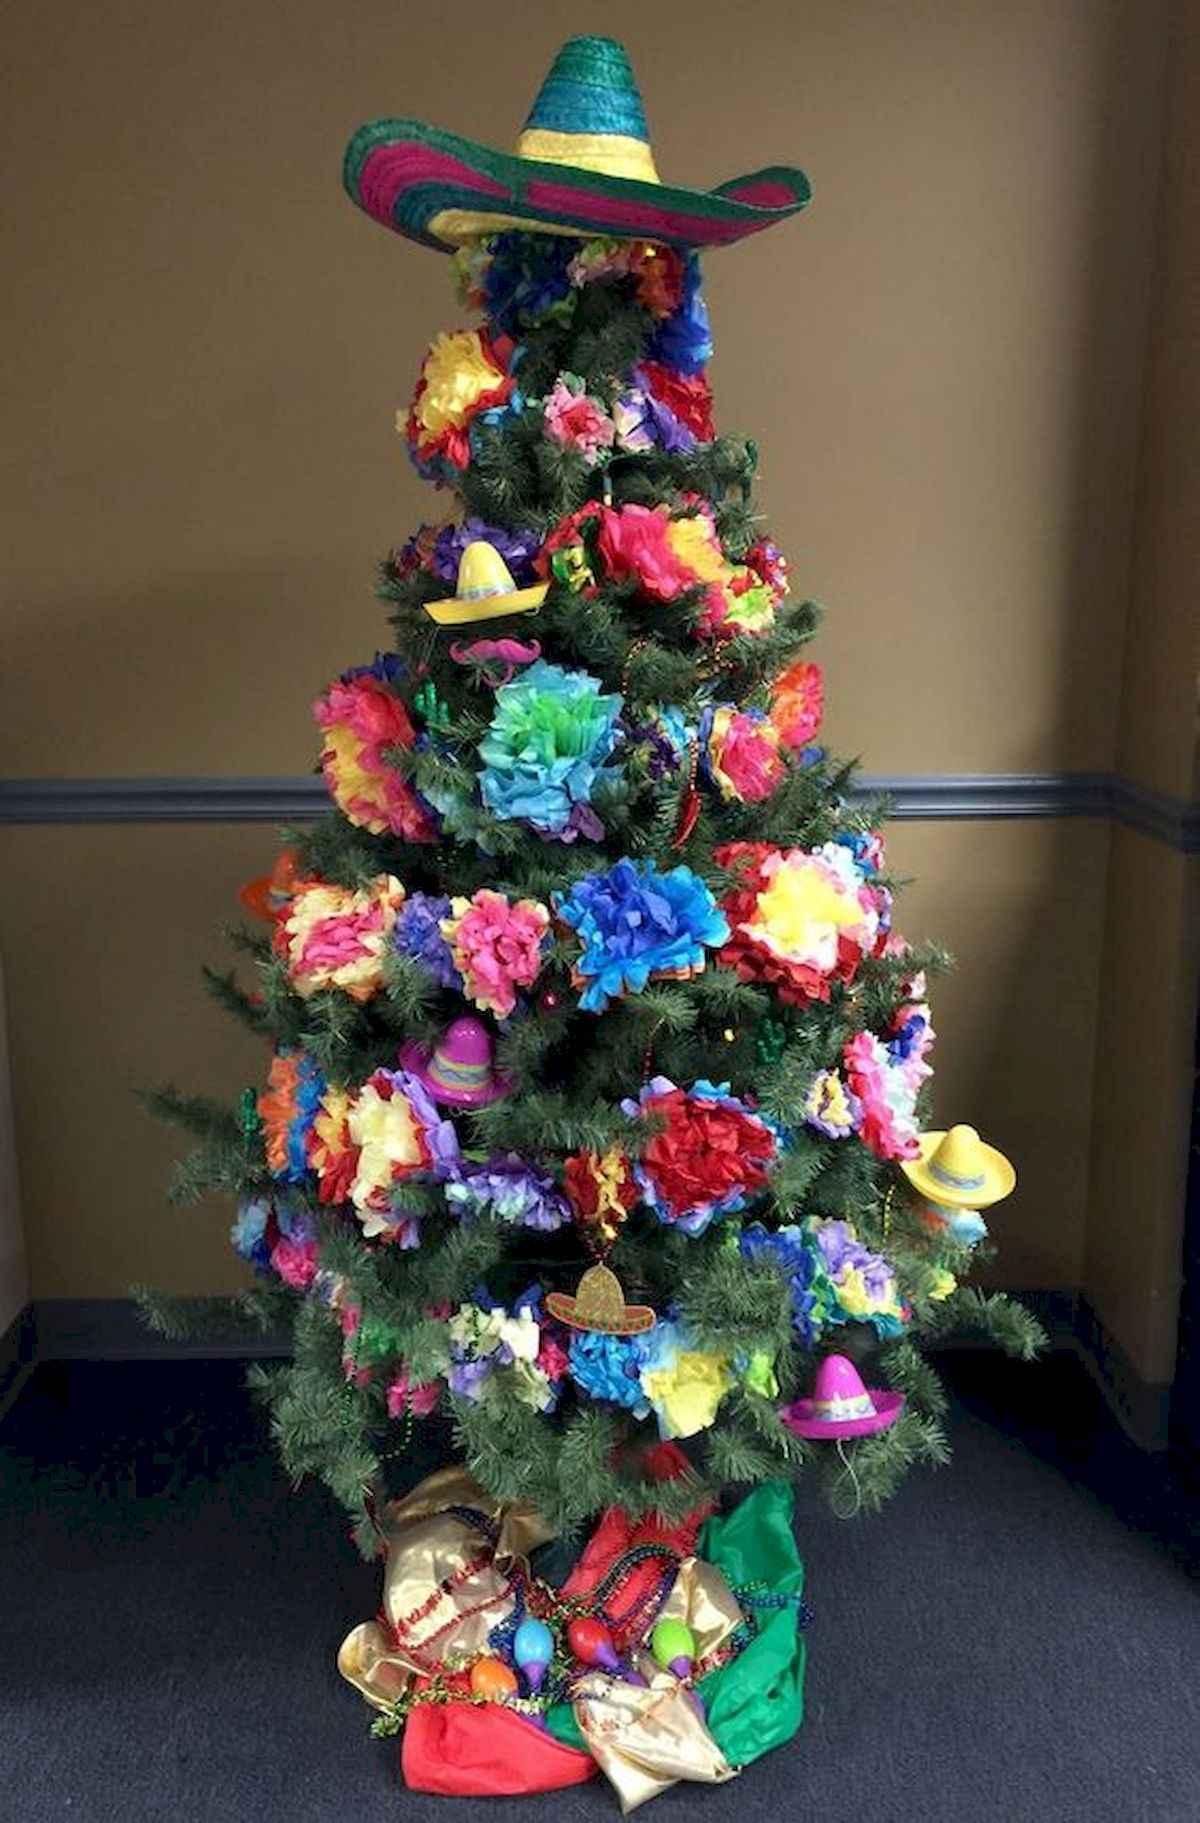 40 unique christmas tree ideas decorations (4)